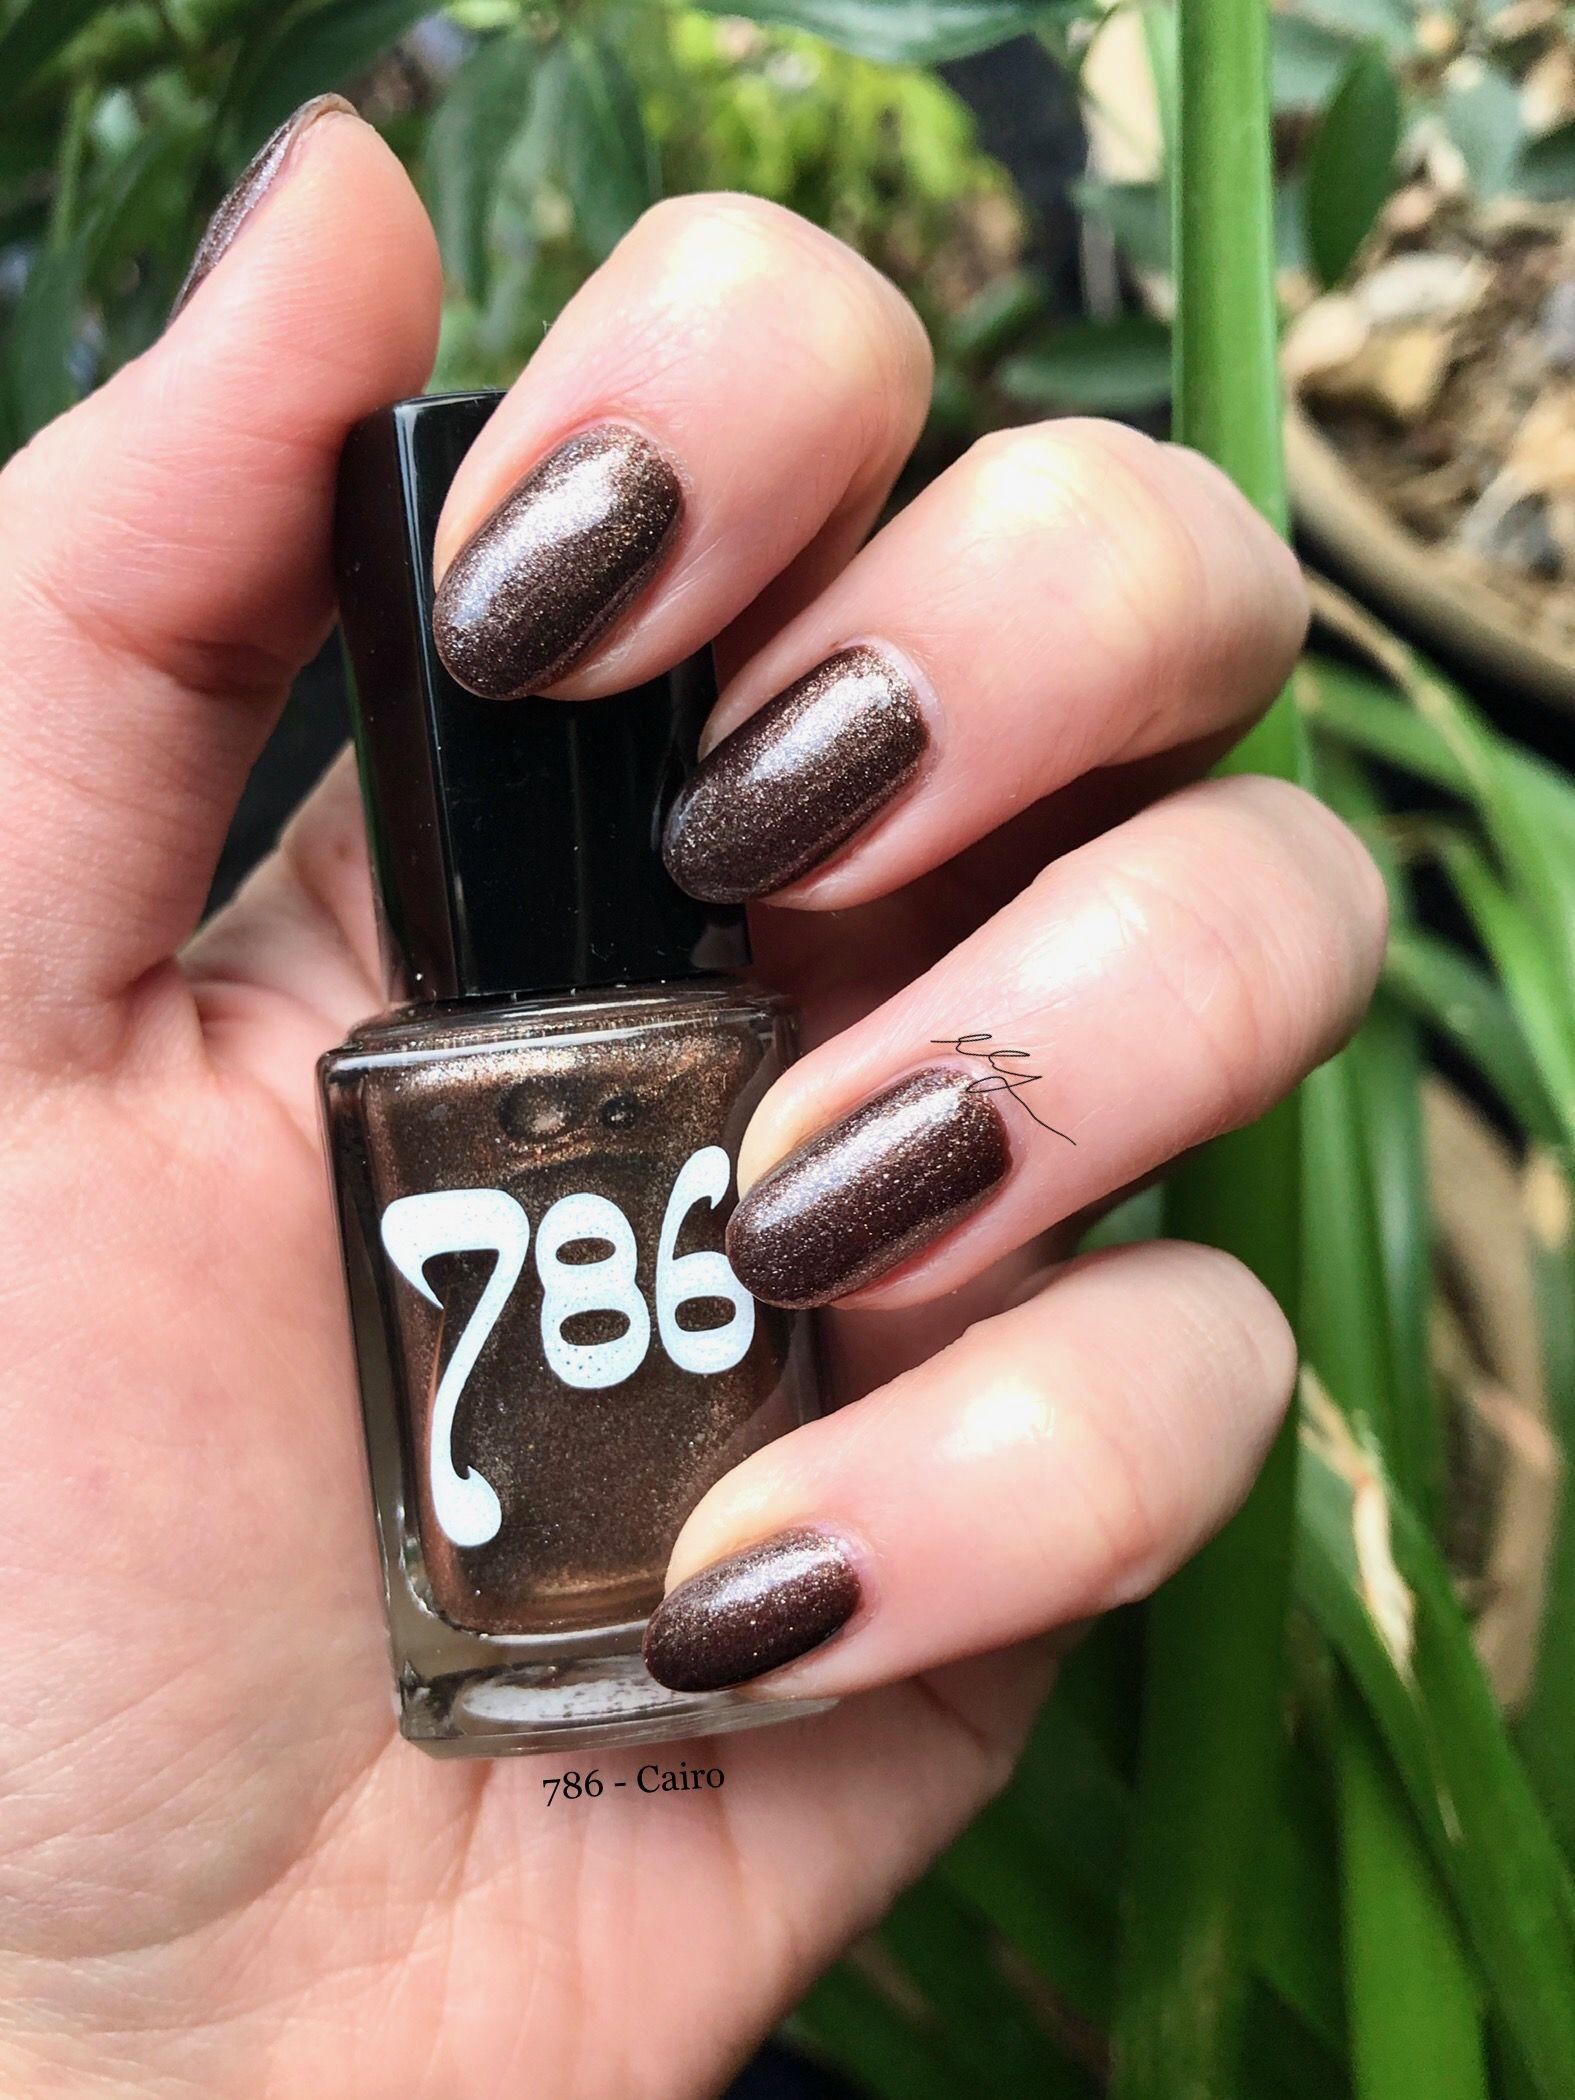 786 Cosmetics - Cairo. Chocolate brown with silver and copper glitter.  Jelly formula. #786cosmetics #cairo #breathablepolis… | Nail polish, Copper  glitter, Manicure